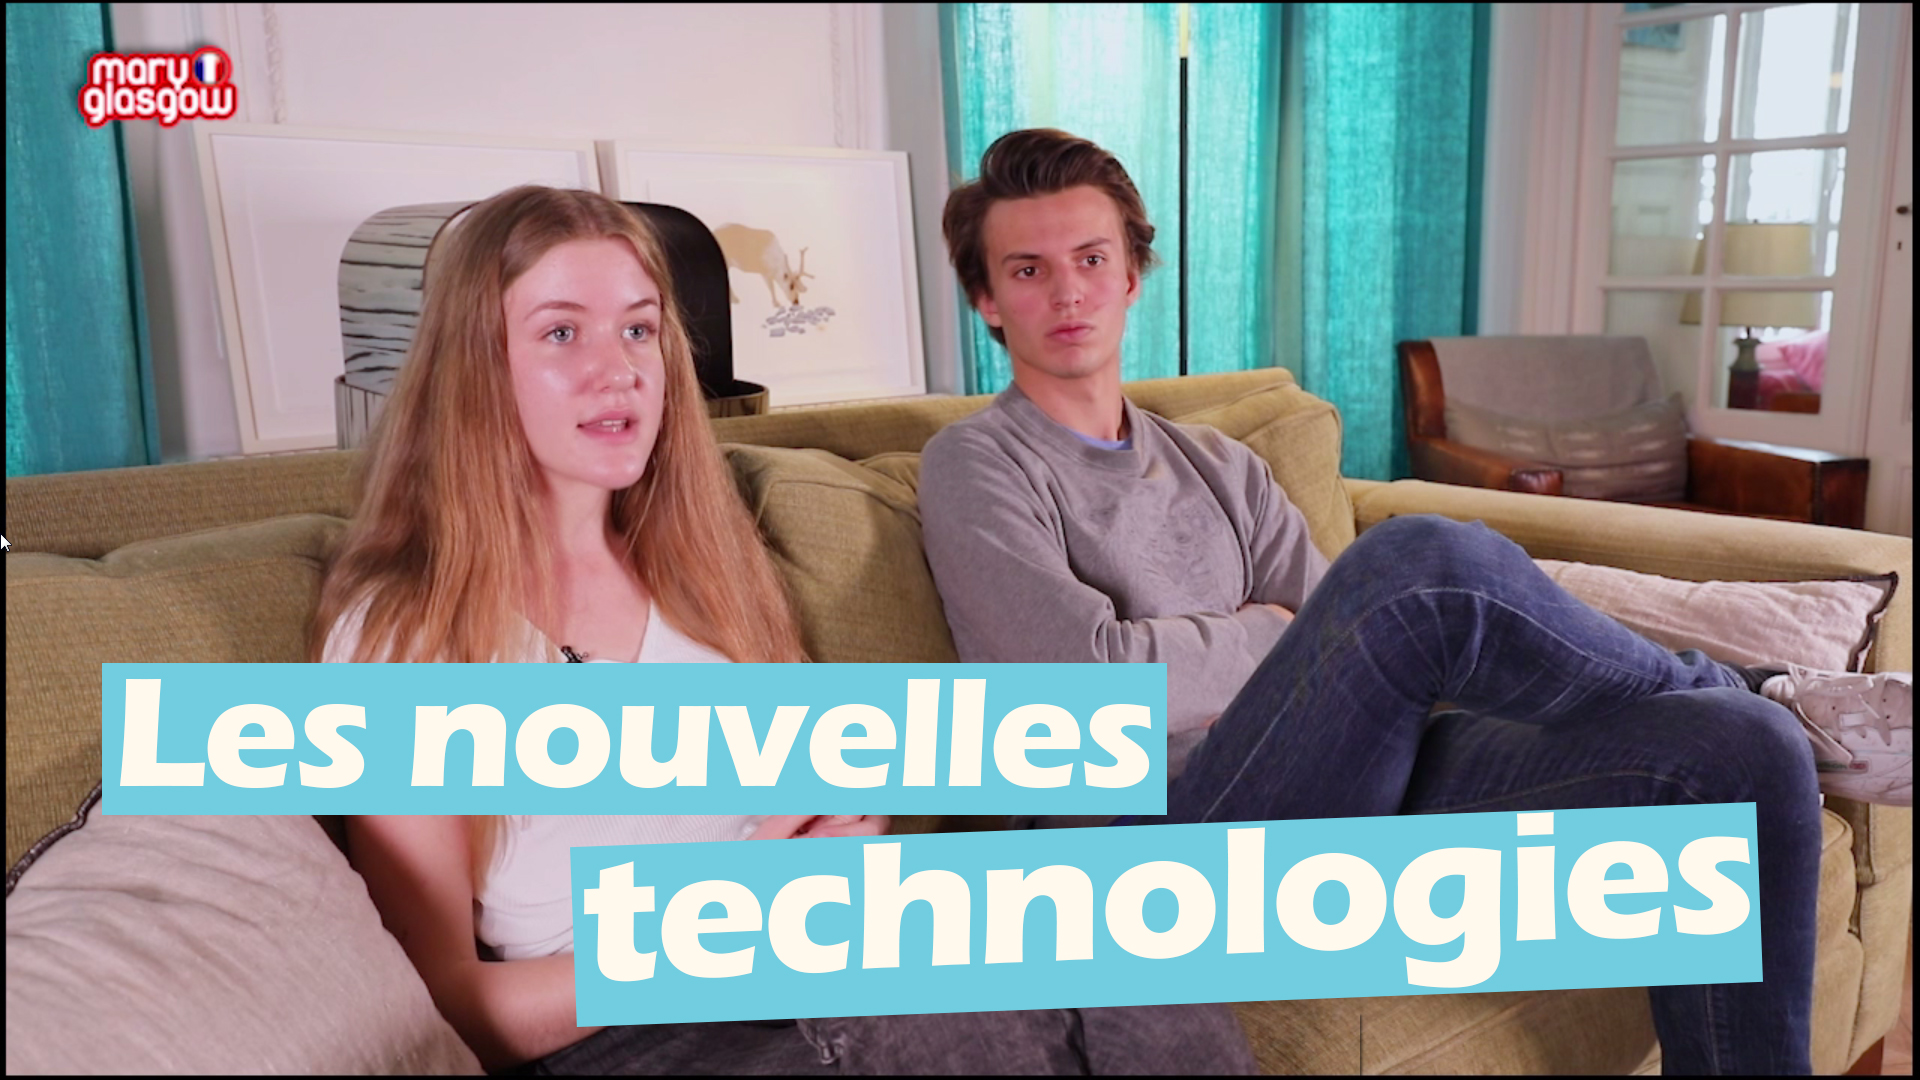 Les nouvelles technologies screenshot